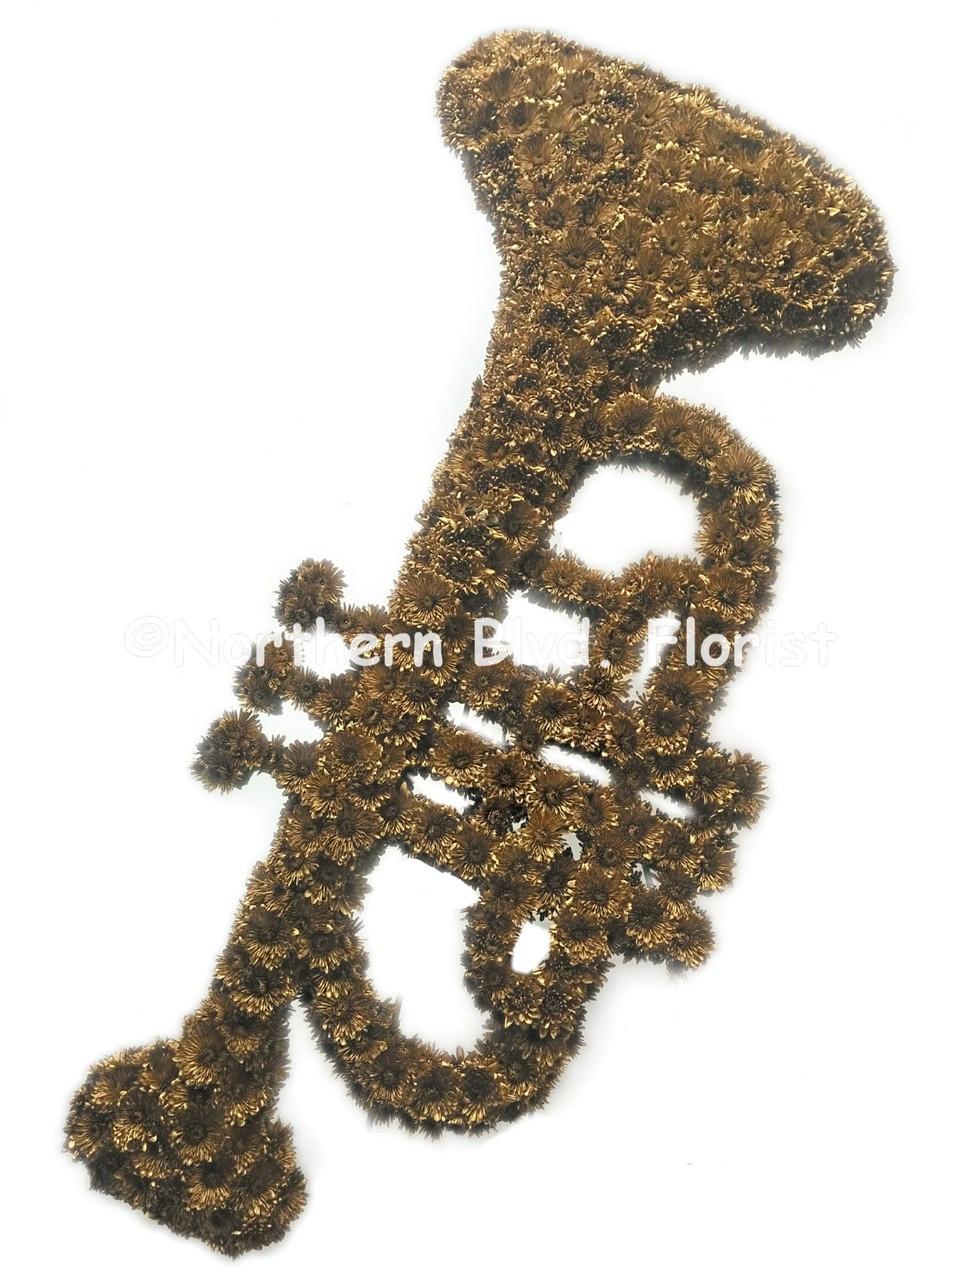 Trumpet funeral flowers custom funeral piece trumpet funeral flowers izmirmasajfo